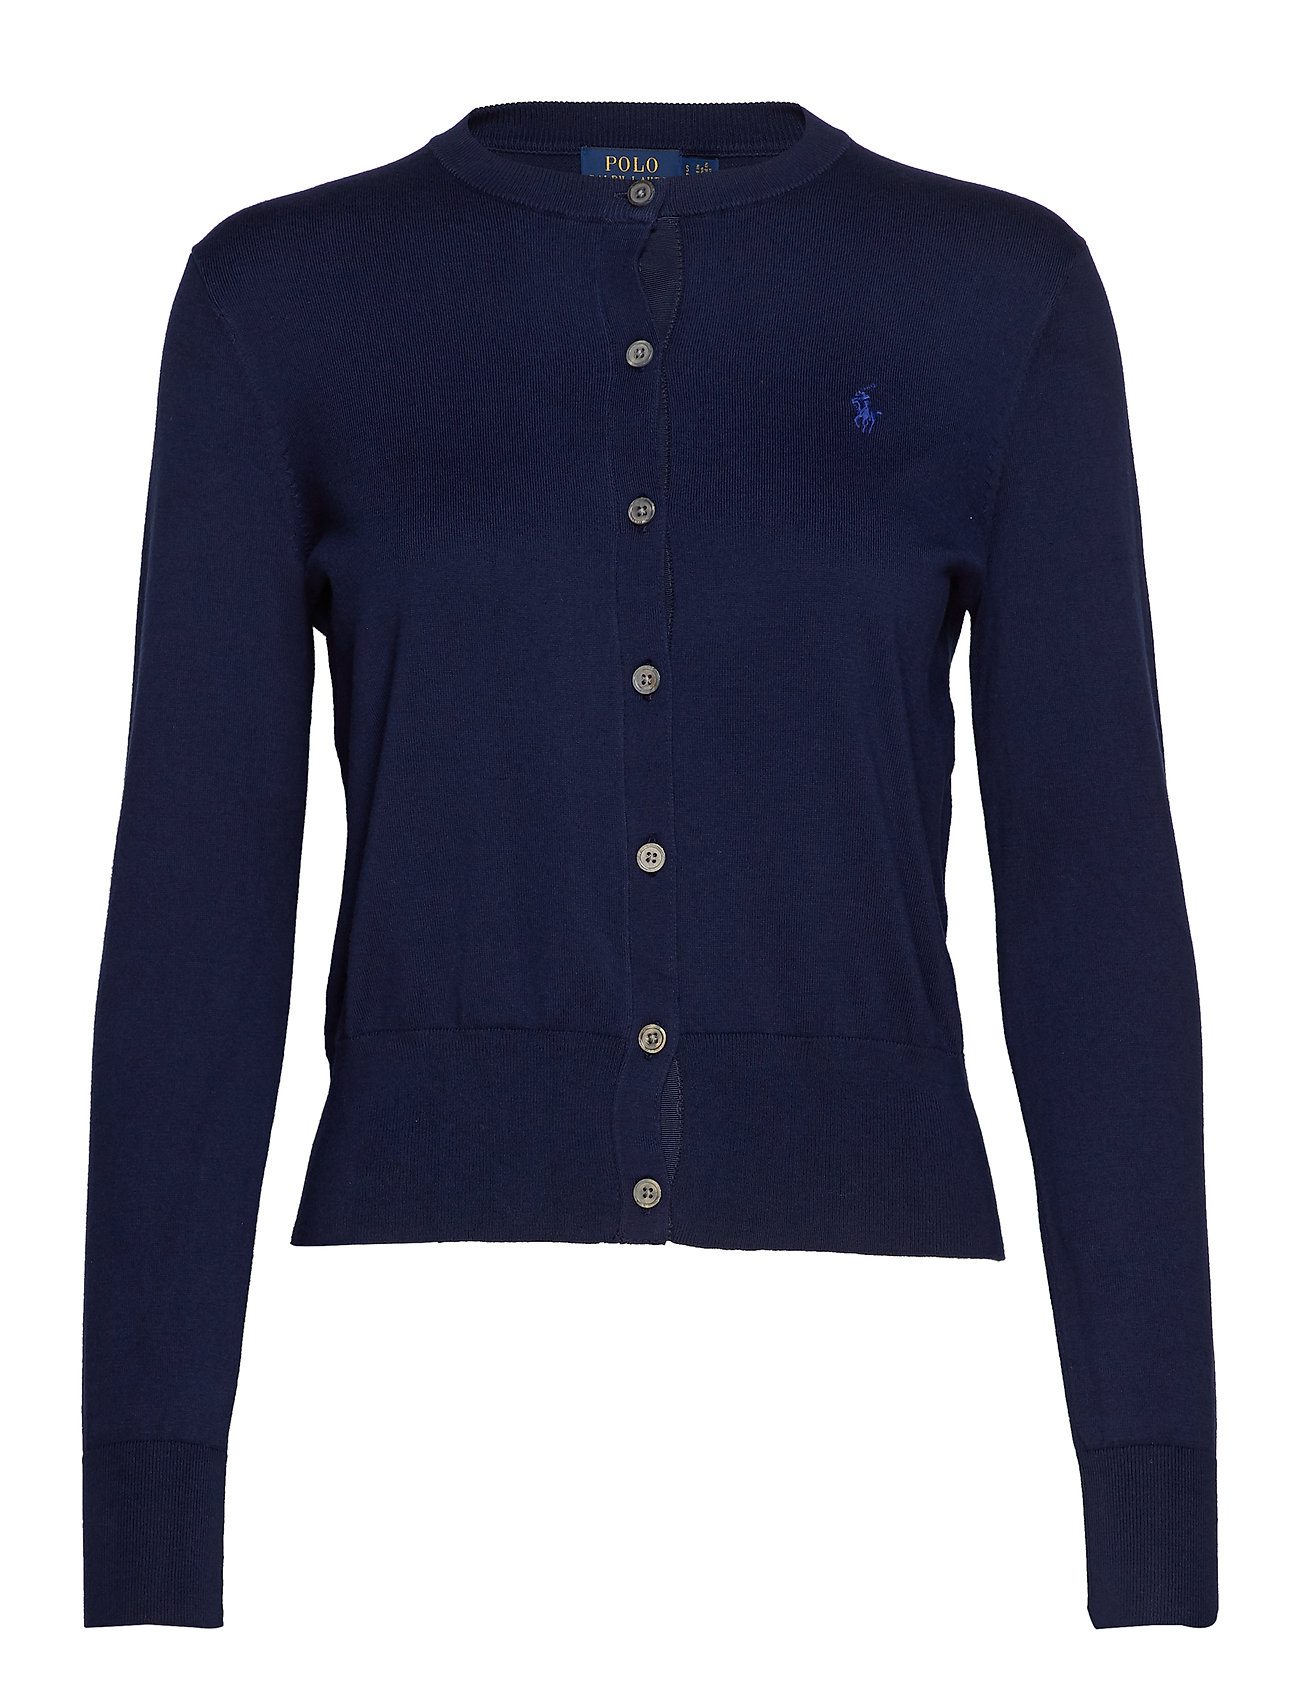 Polo Ralph Lauren Cotton Cardigan Sweater